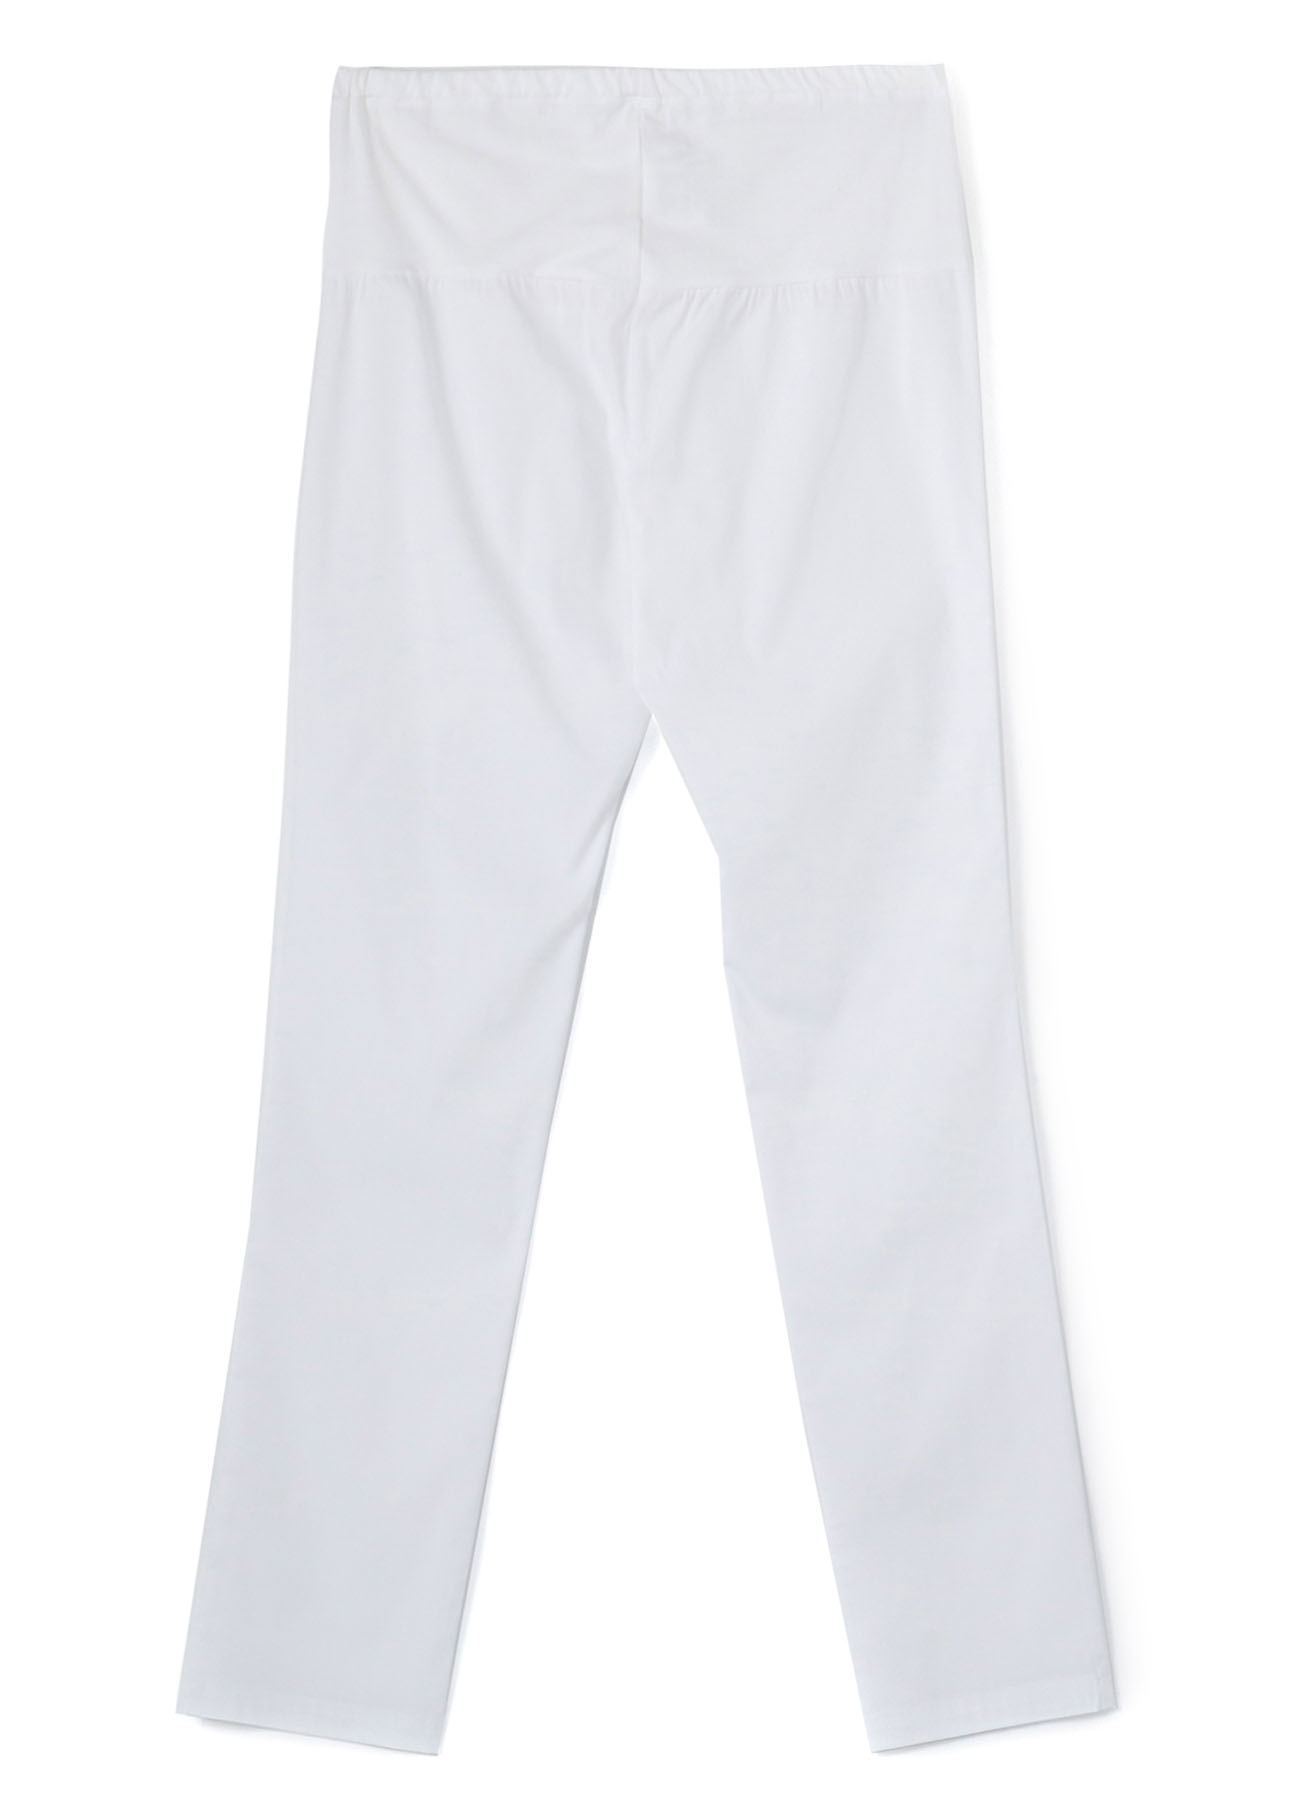 C/N STRETCH SLIM PANTS